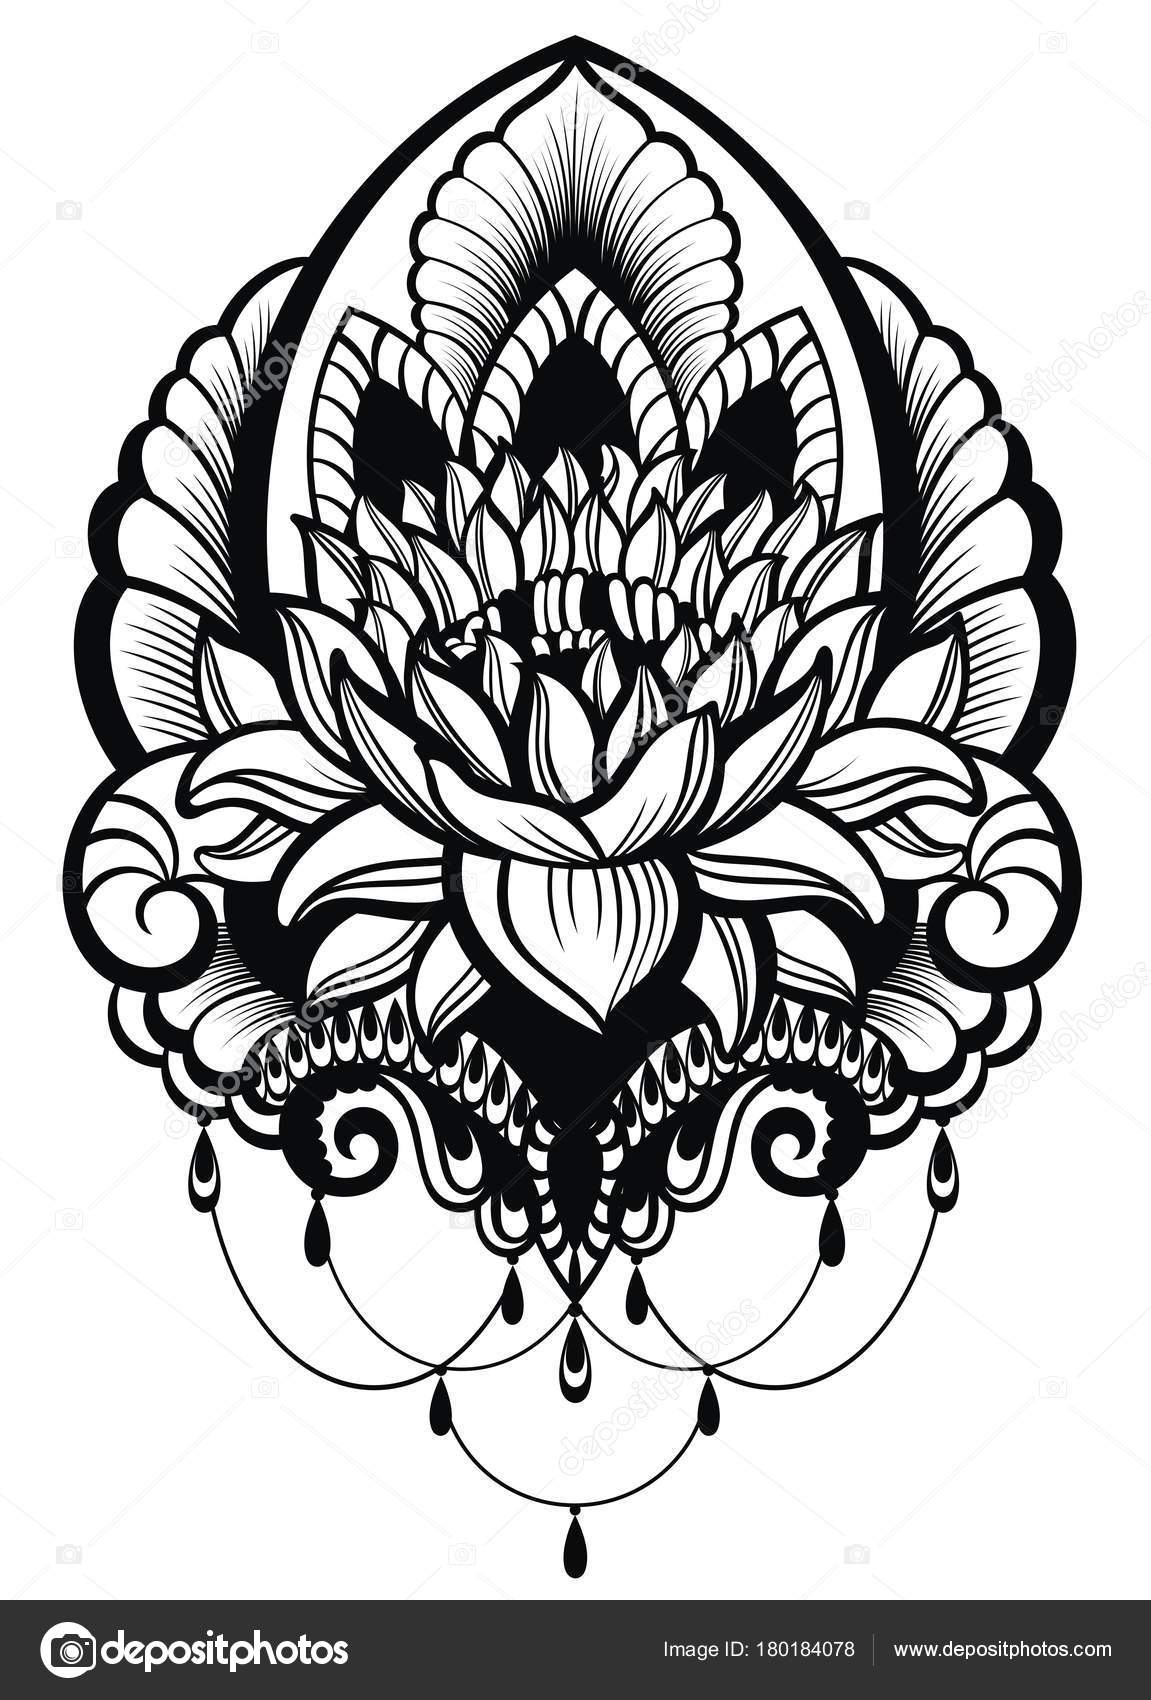 Dibujos Mandalas Flor De Loto Para Imprimir Estilo Oriental